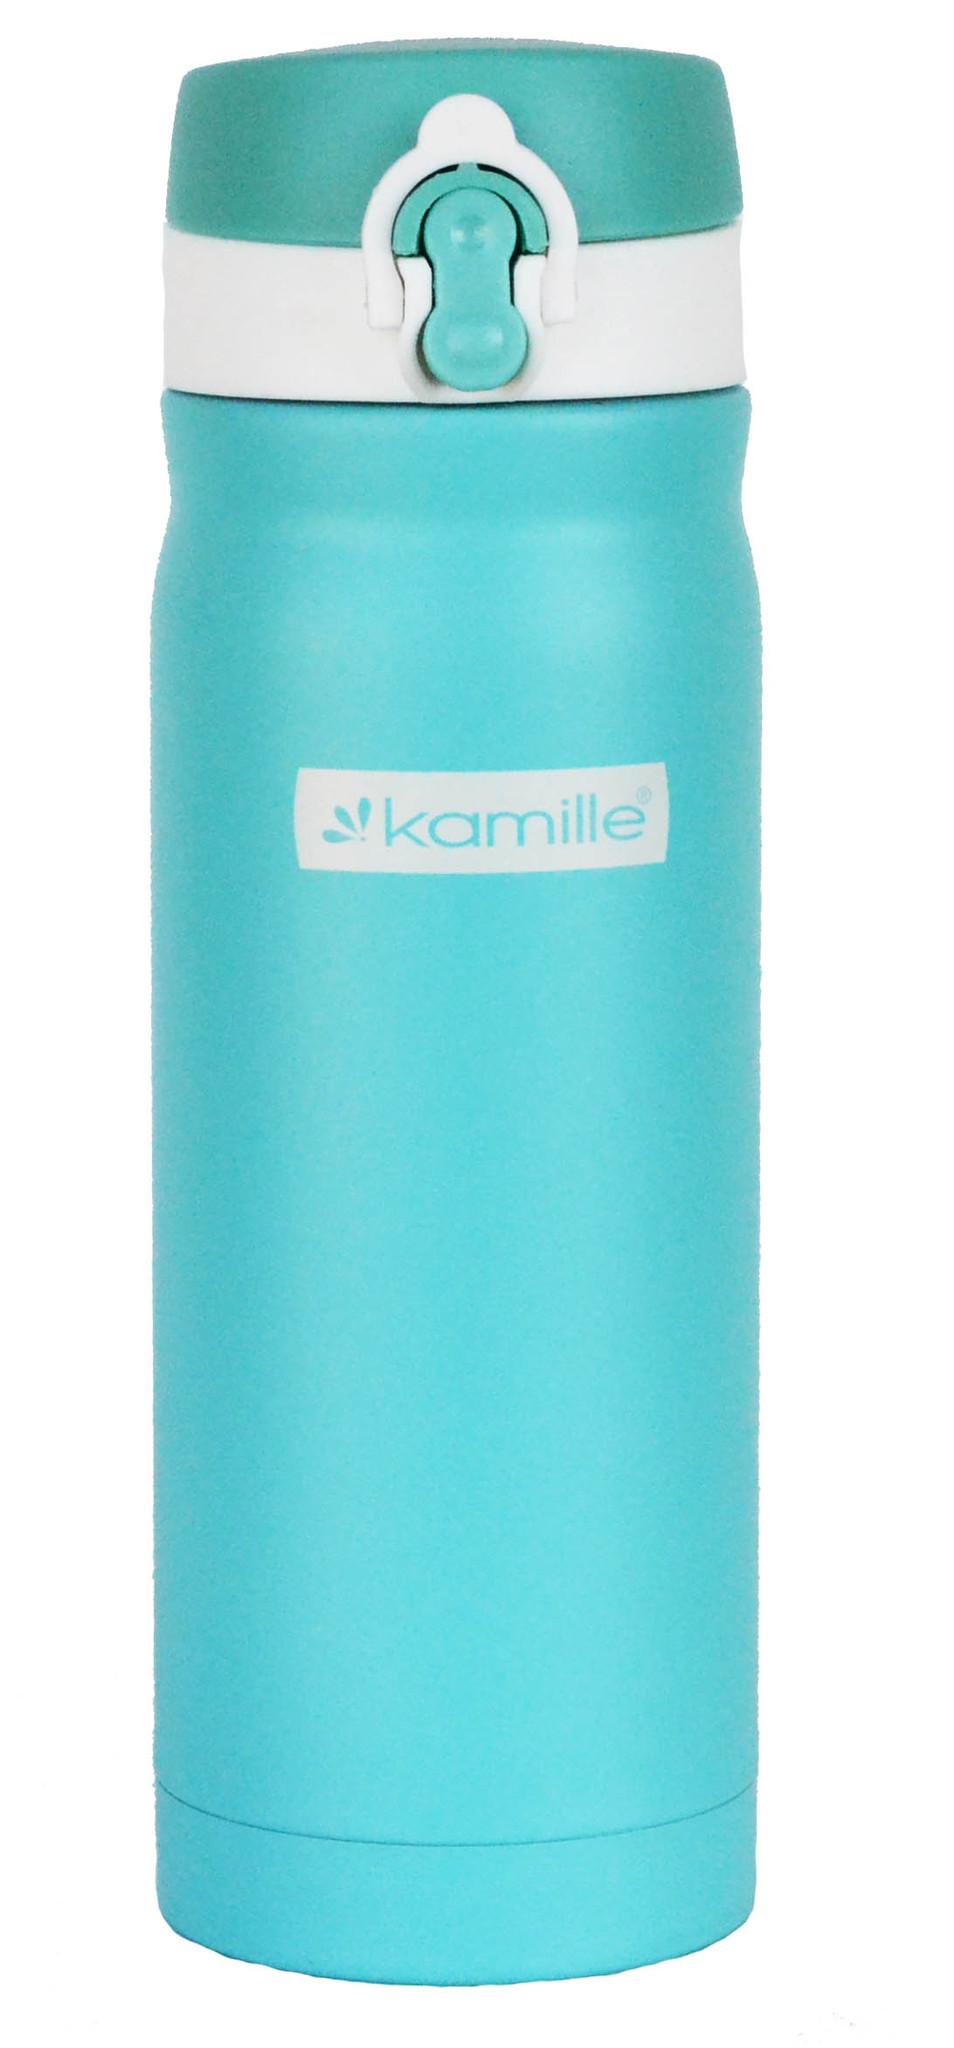 Термос-кружка Kamille 500 мл. бирюзовый